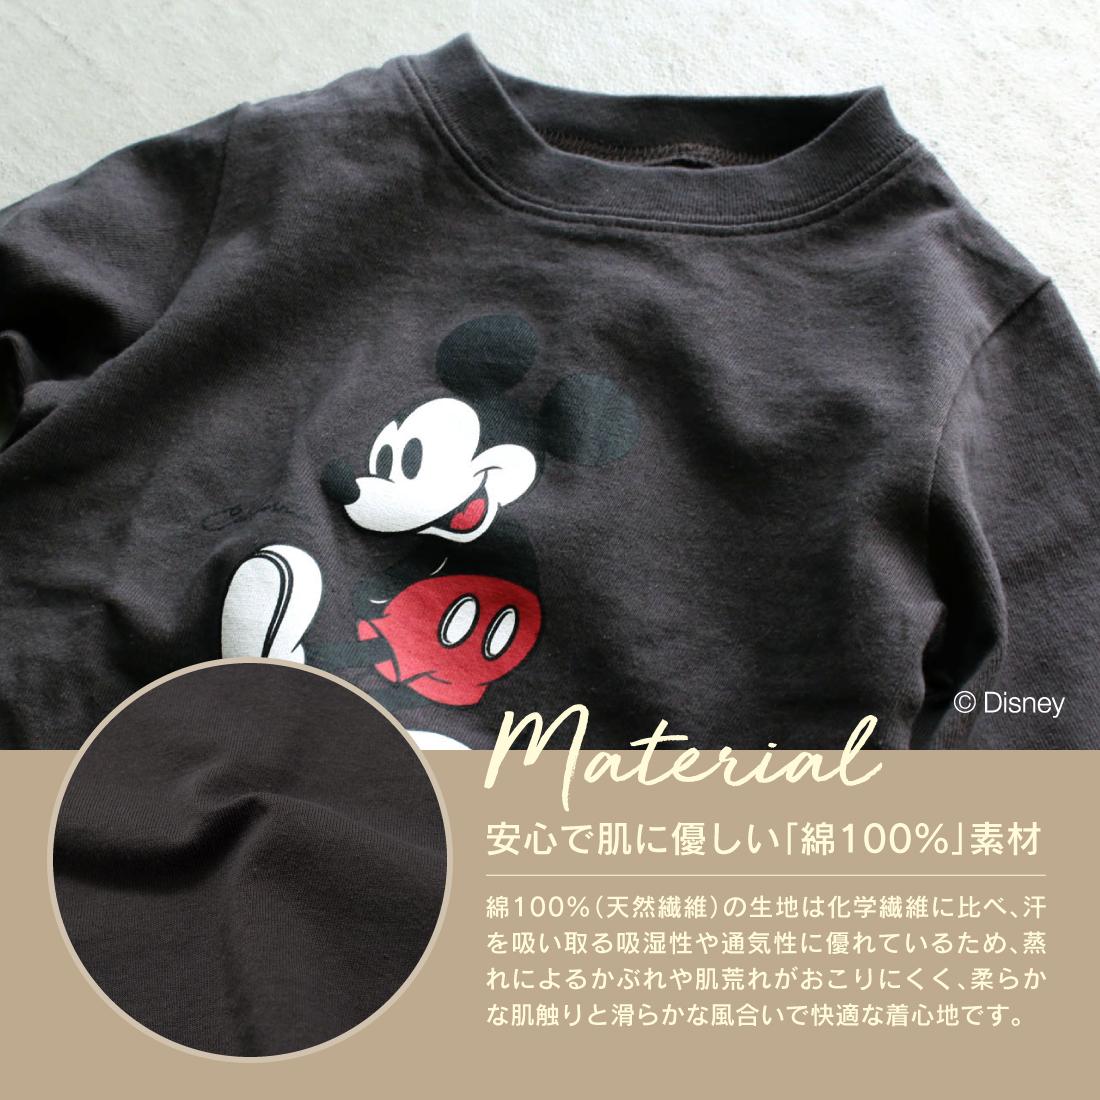 THE CLASSIC ミッキーマウスロンT(80cm 90cm 100cm 110cm 120cm 130cm 140cm 150cm) Disney 長袖Tシャツ 21SS【メール便可】